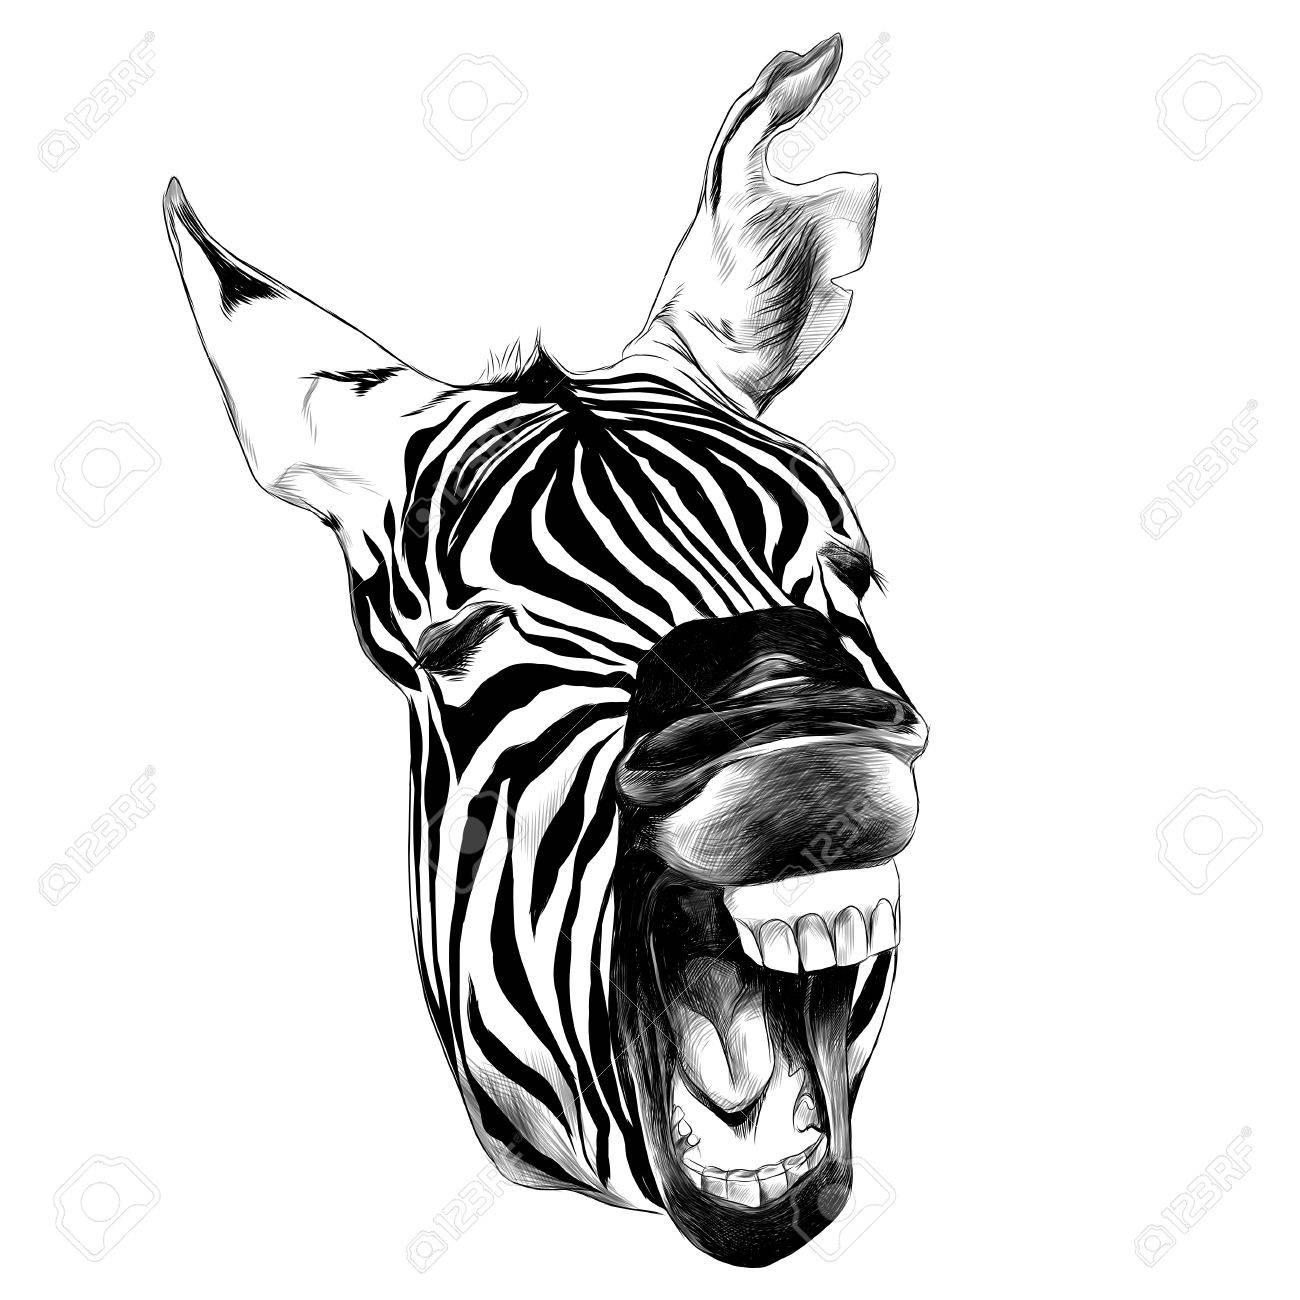 1300x1300 Zebra Head Contorts Face. Royalty Free Cliparts, Vectors,